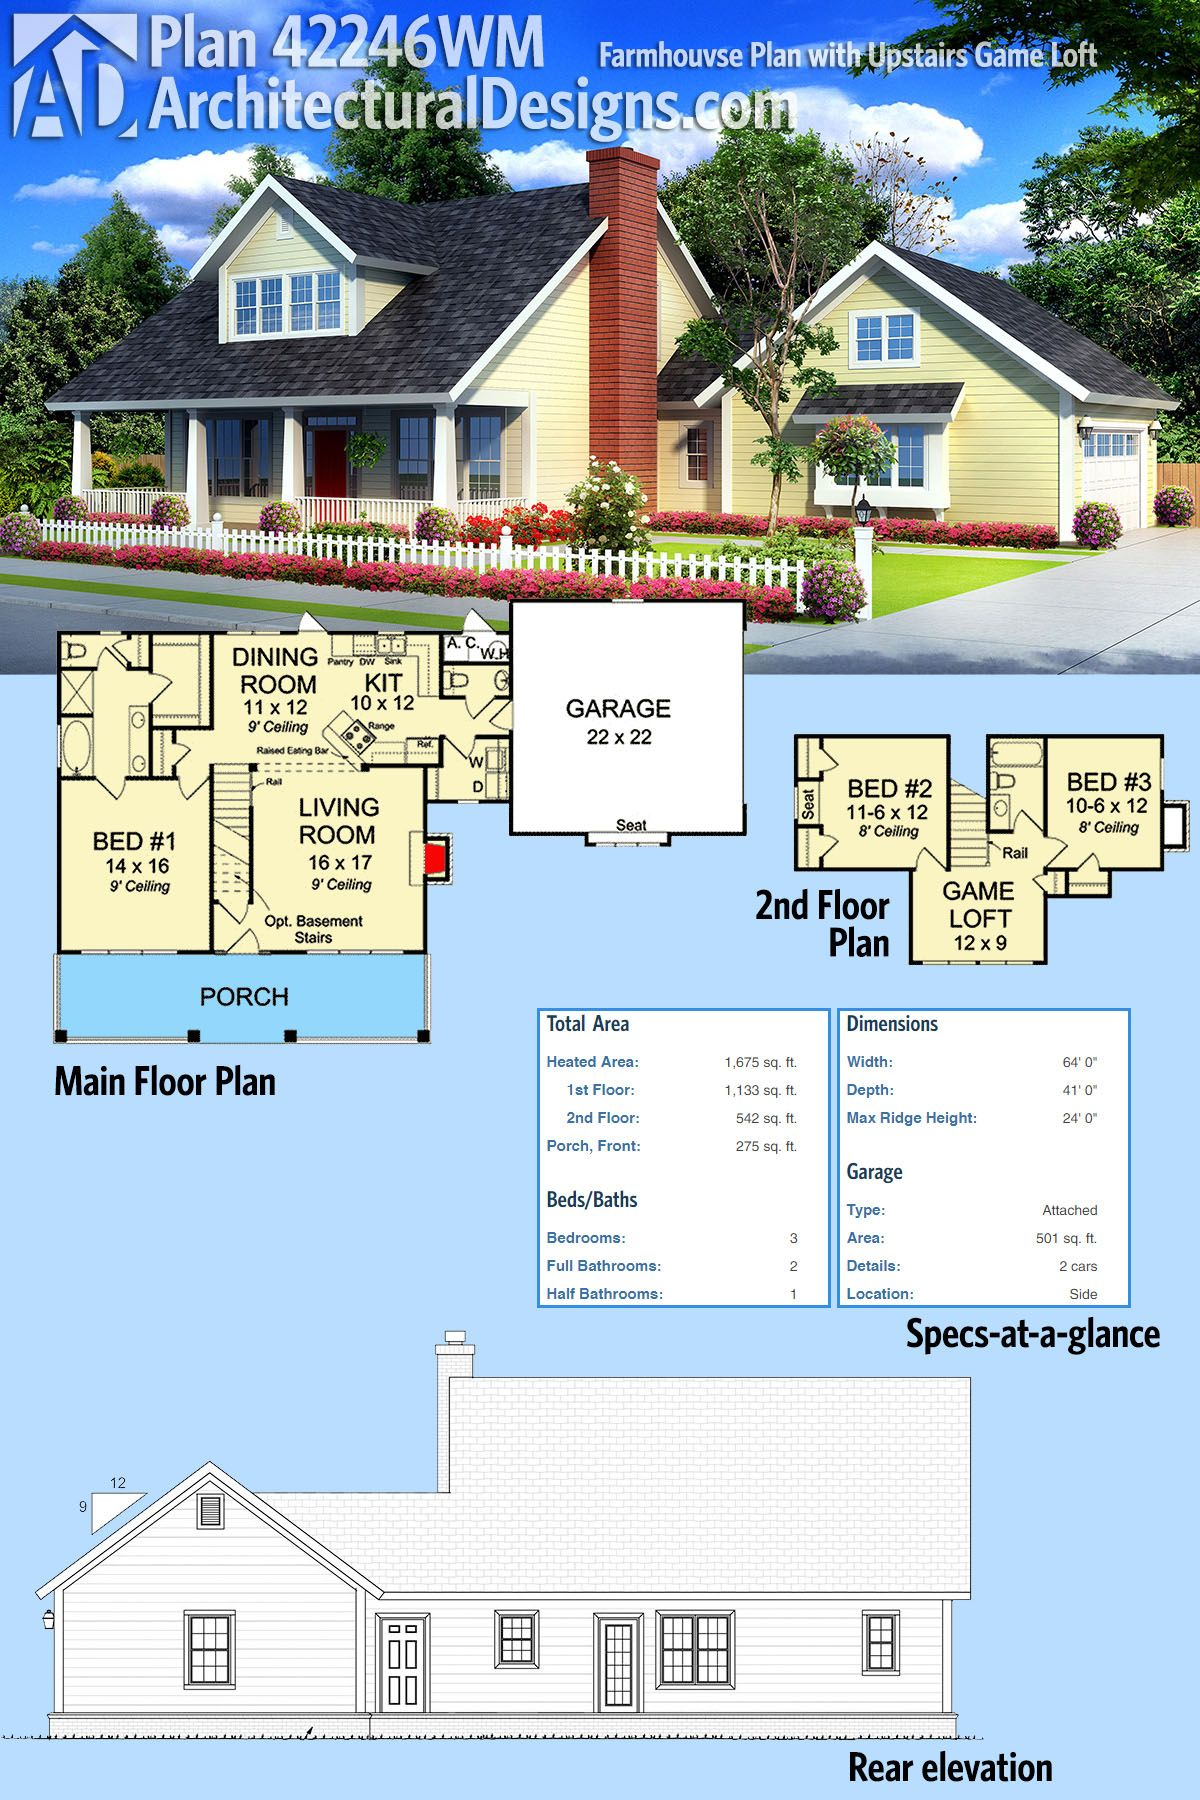 Plan 42246WM: Farmhouse Plan With Upstairs Game Loft